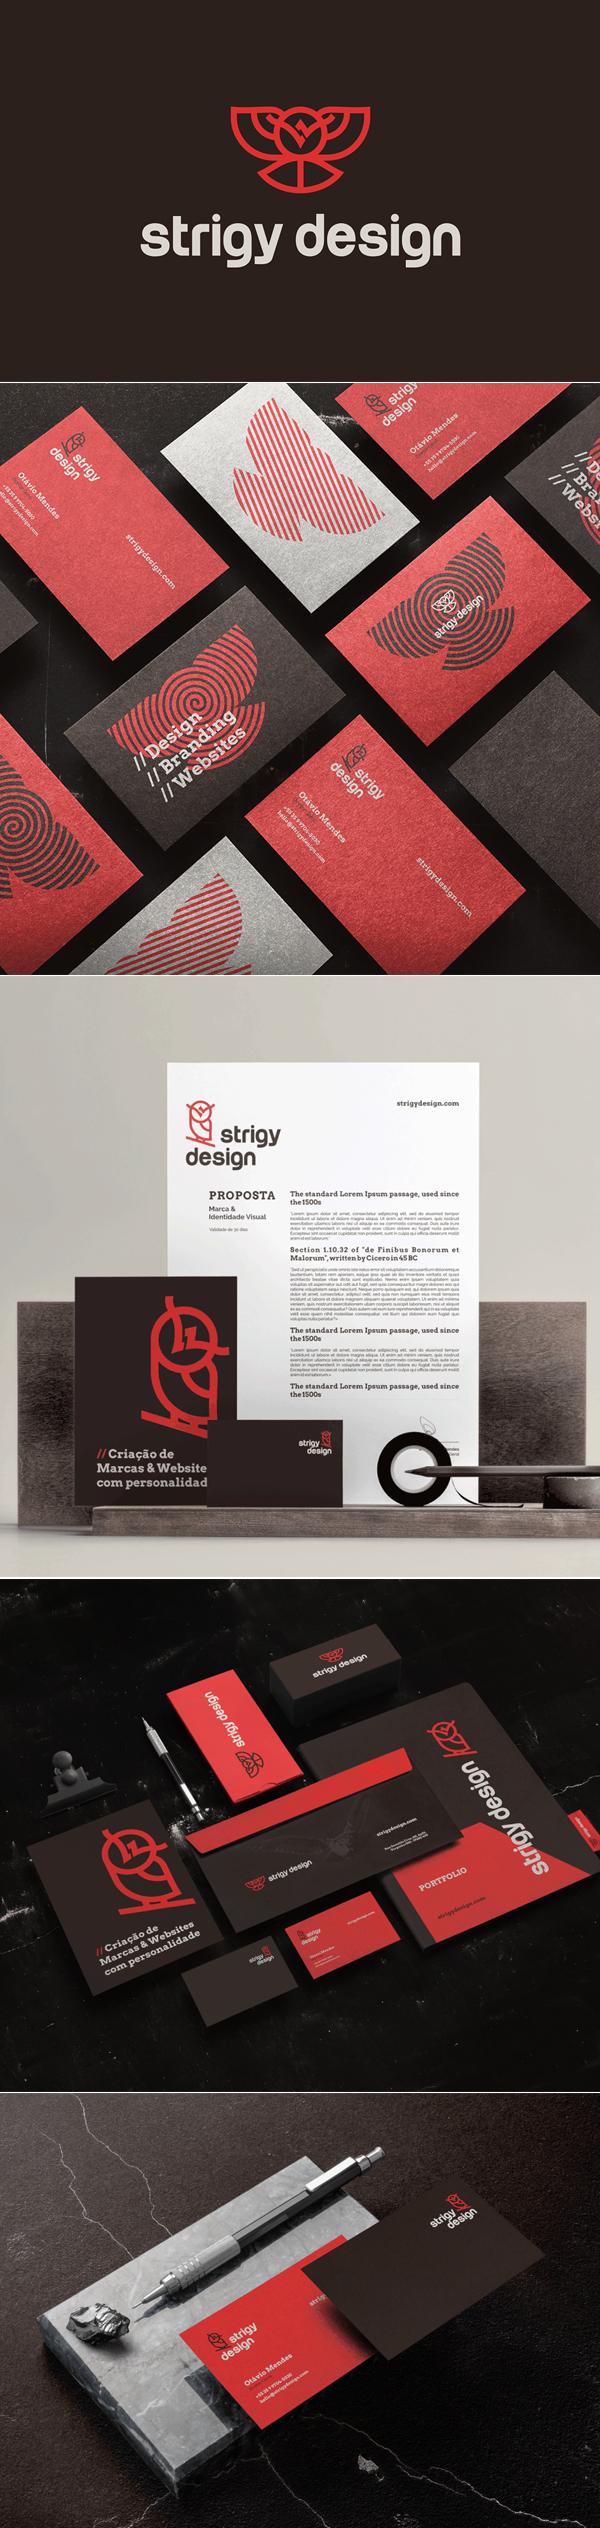 Business Card - Strigy Design Branding Identity by Strigy Design